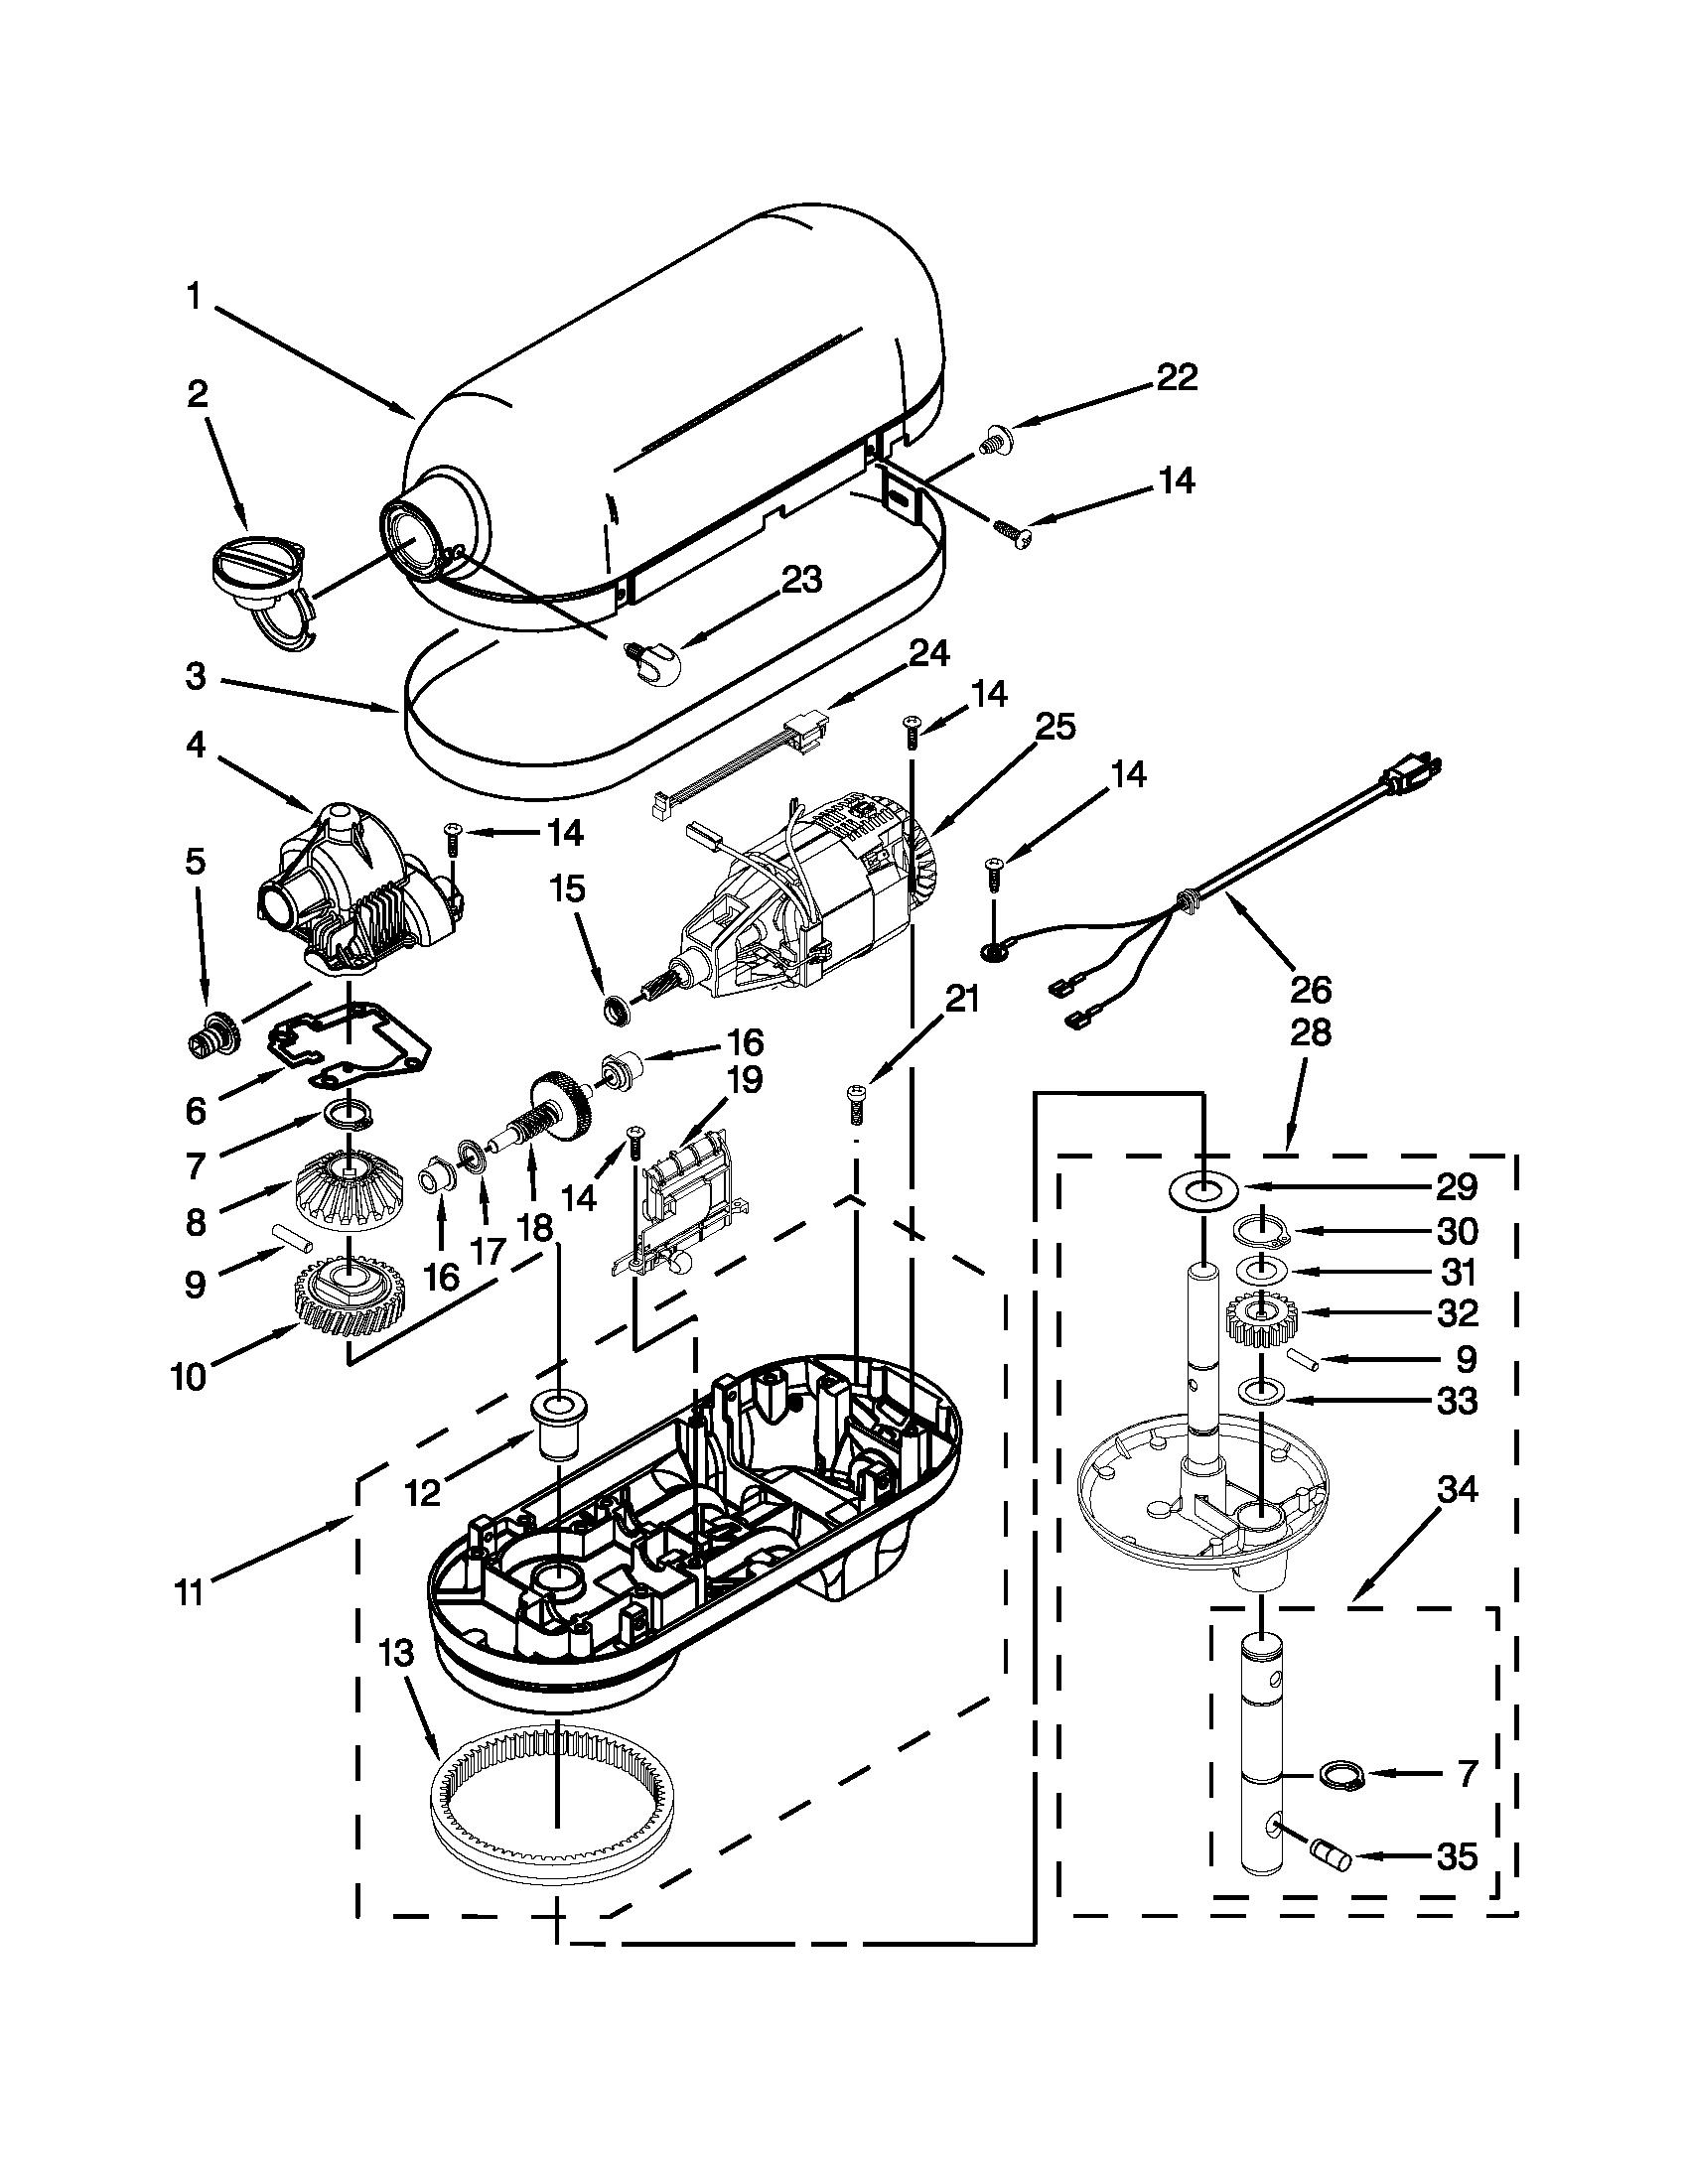 Kitchenaid Mixer Parts